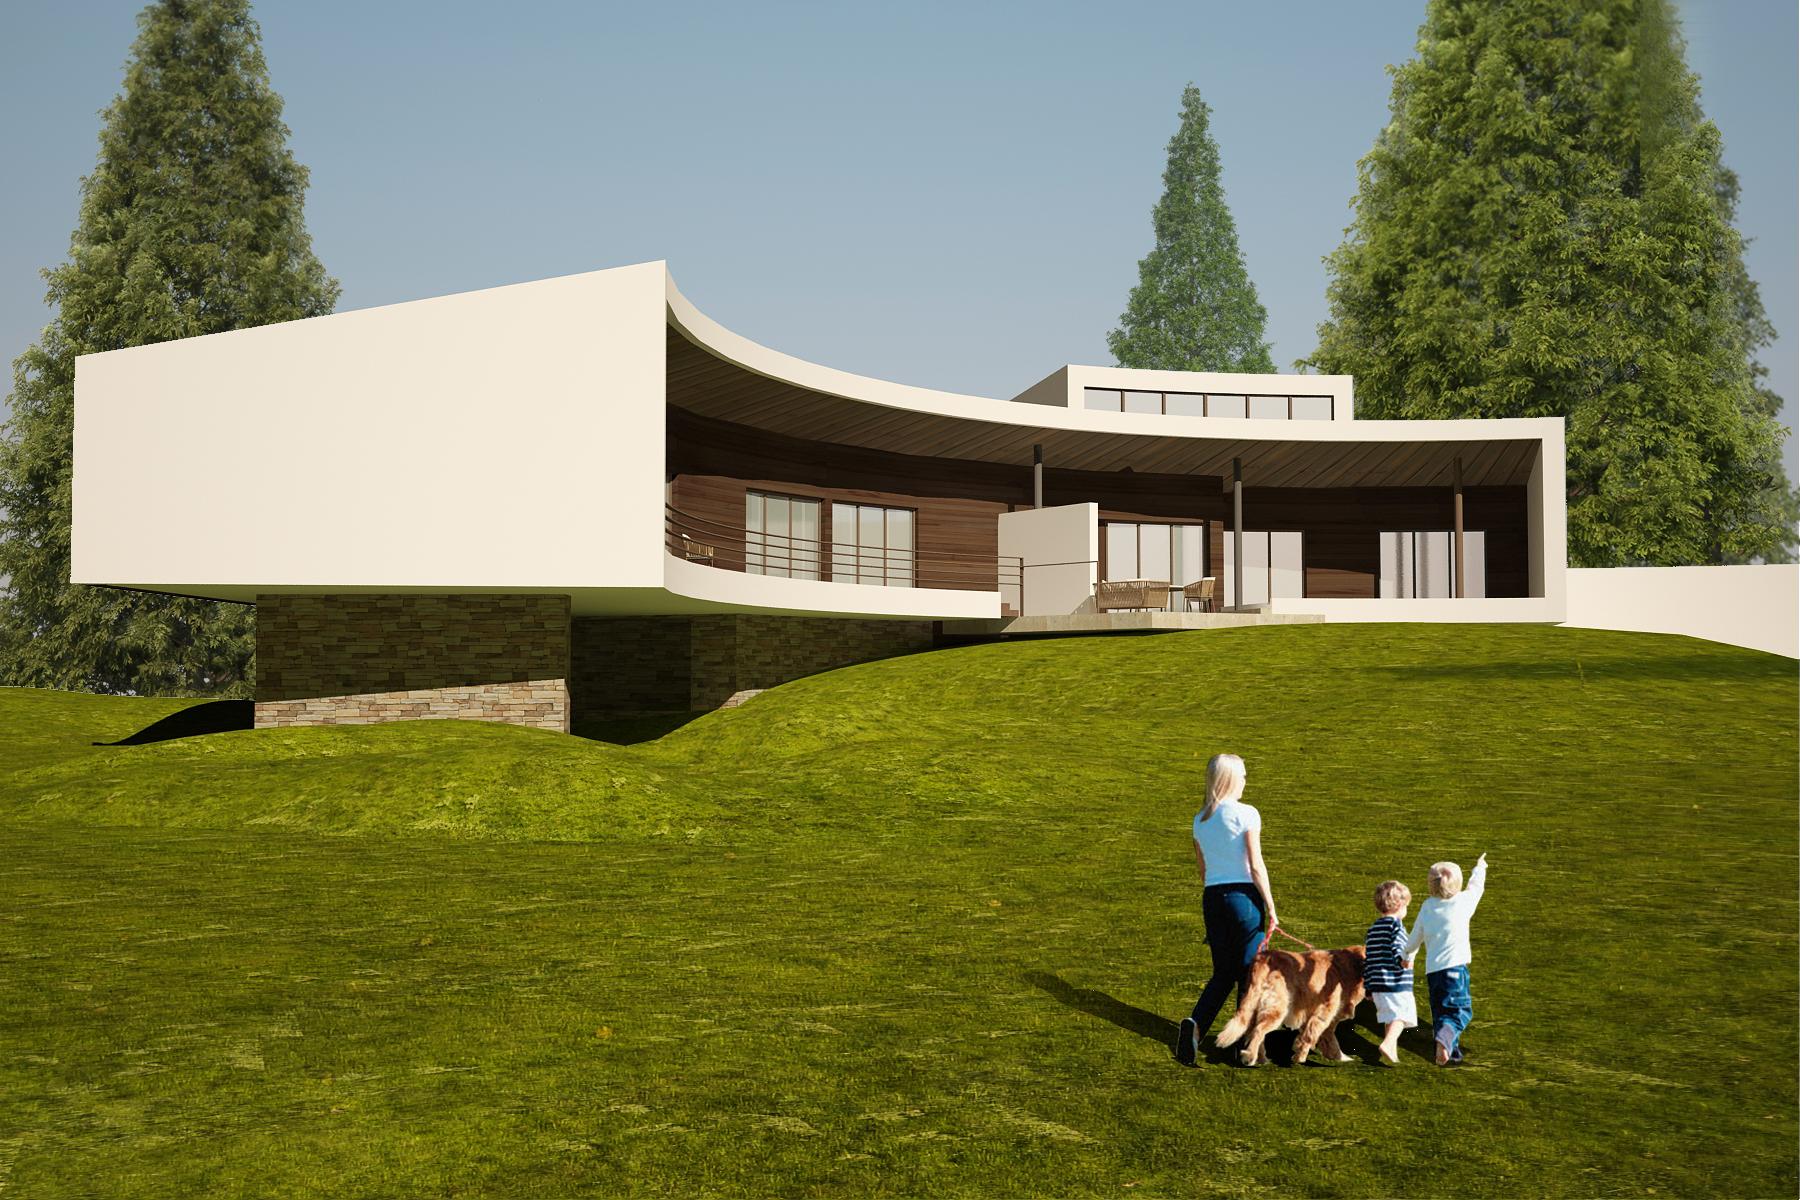 https://nbc-arhitect.ro/wp-content/uploads/2020/10/NBC-Arhitect-_-Breaza-House-_-Breaza-Romania-_-exterior-view_3.jpg